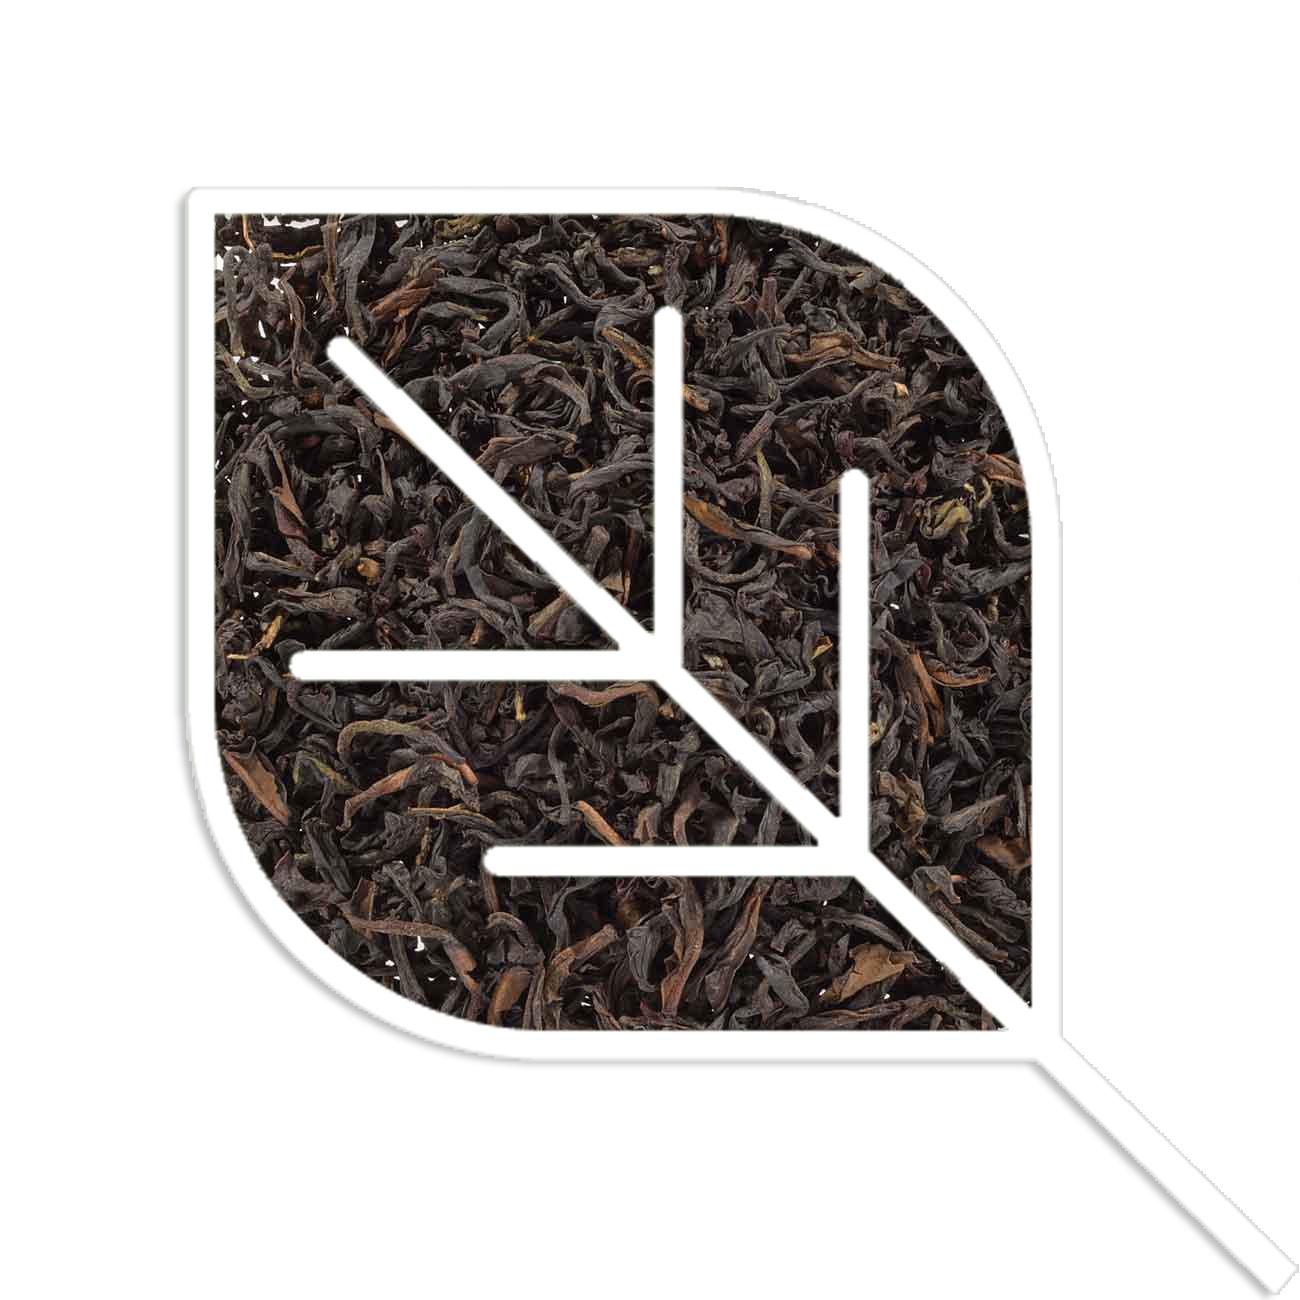 Puur Natuur Colombian Organic Black Tea-1